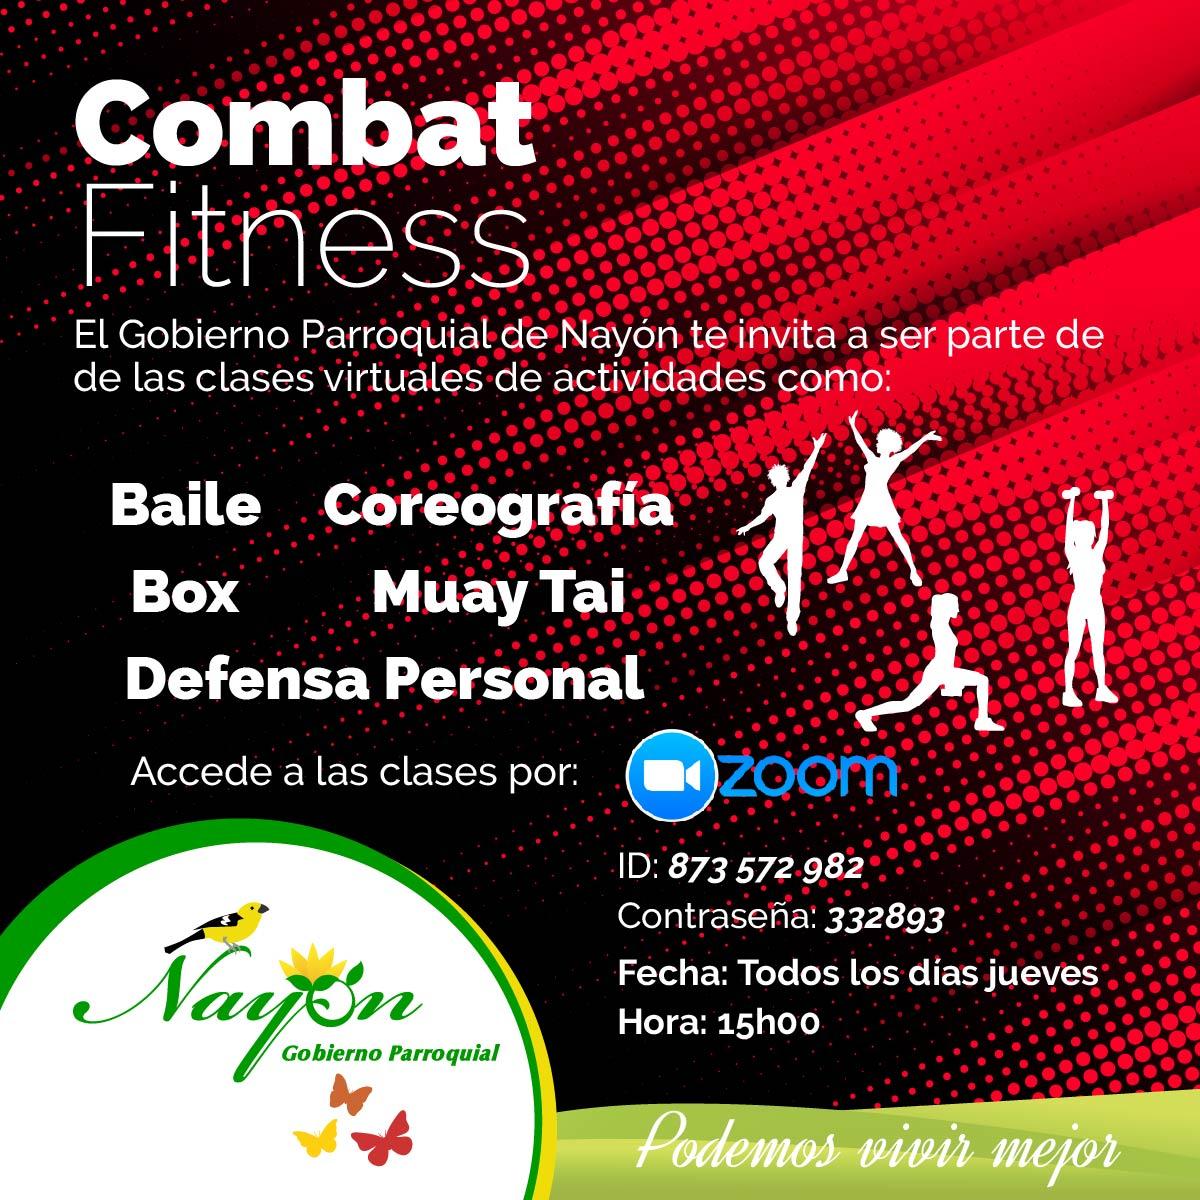 Clases Virtuales de Combat Fitness